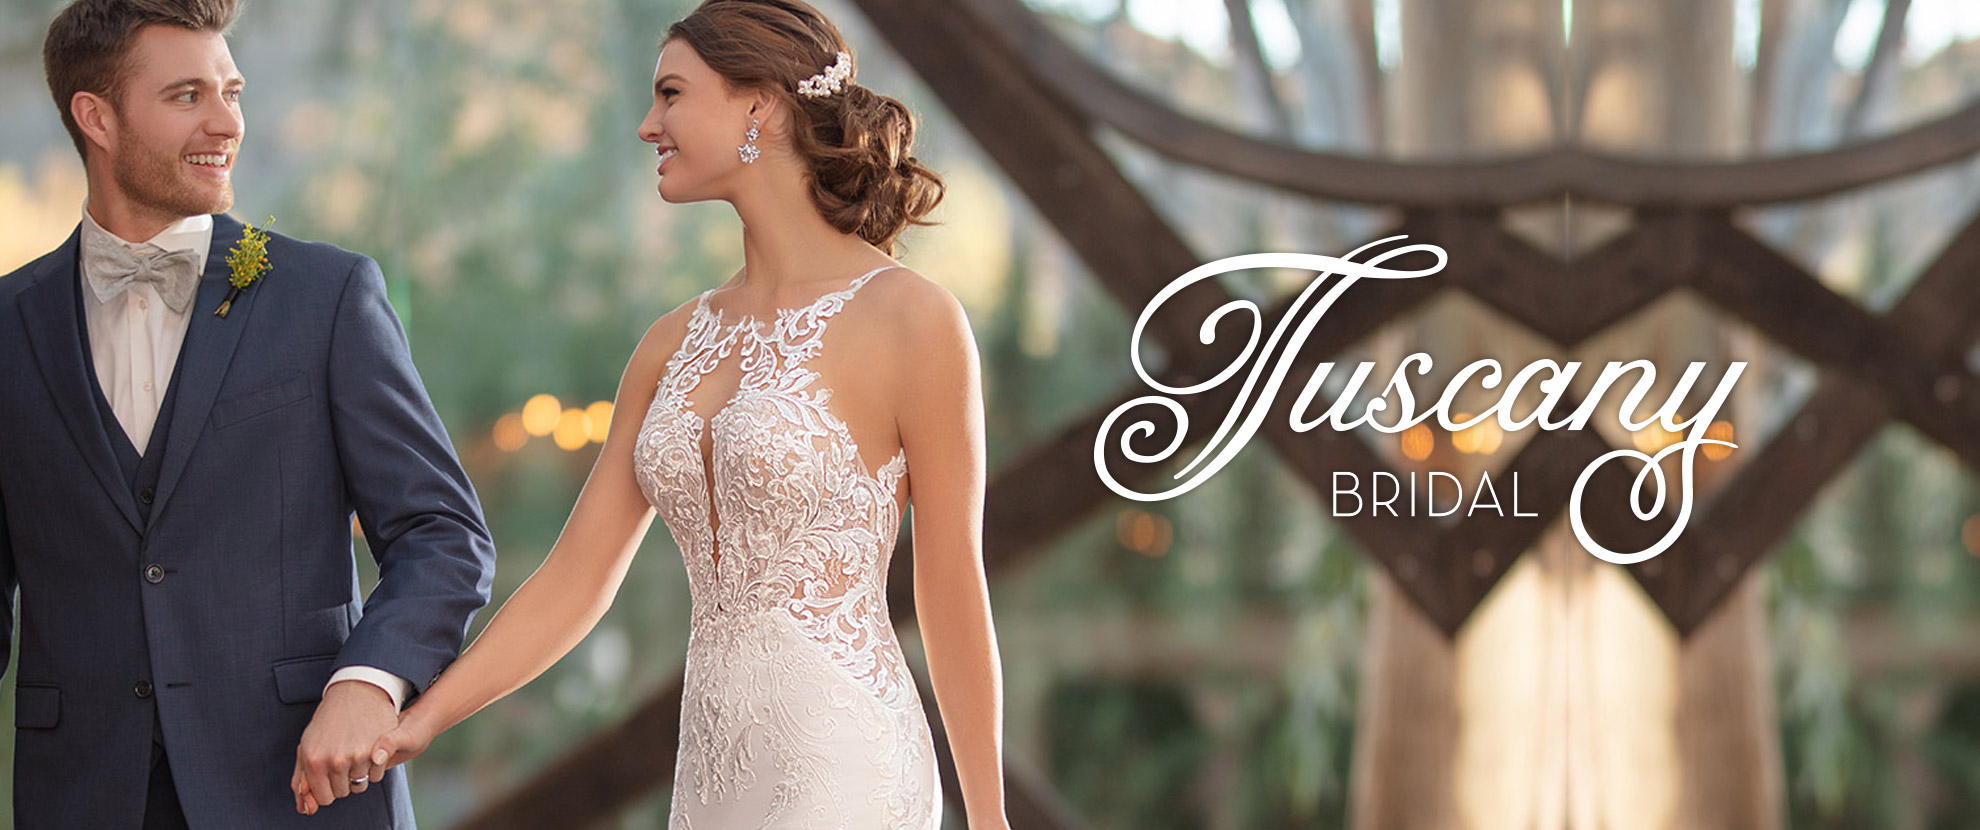 Wedding Dresses Perth Wedding Gowns Tuscany Bridal